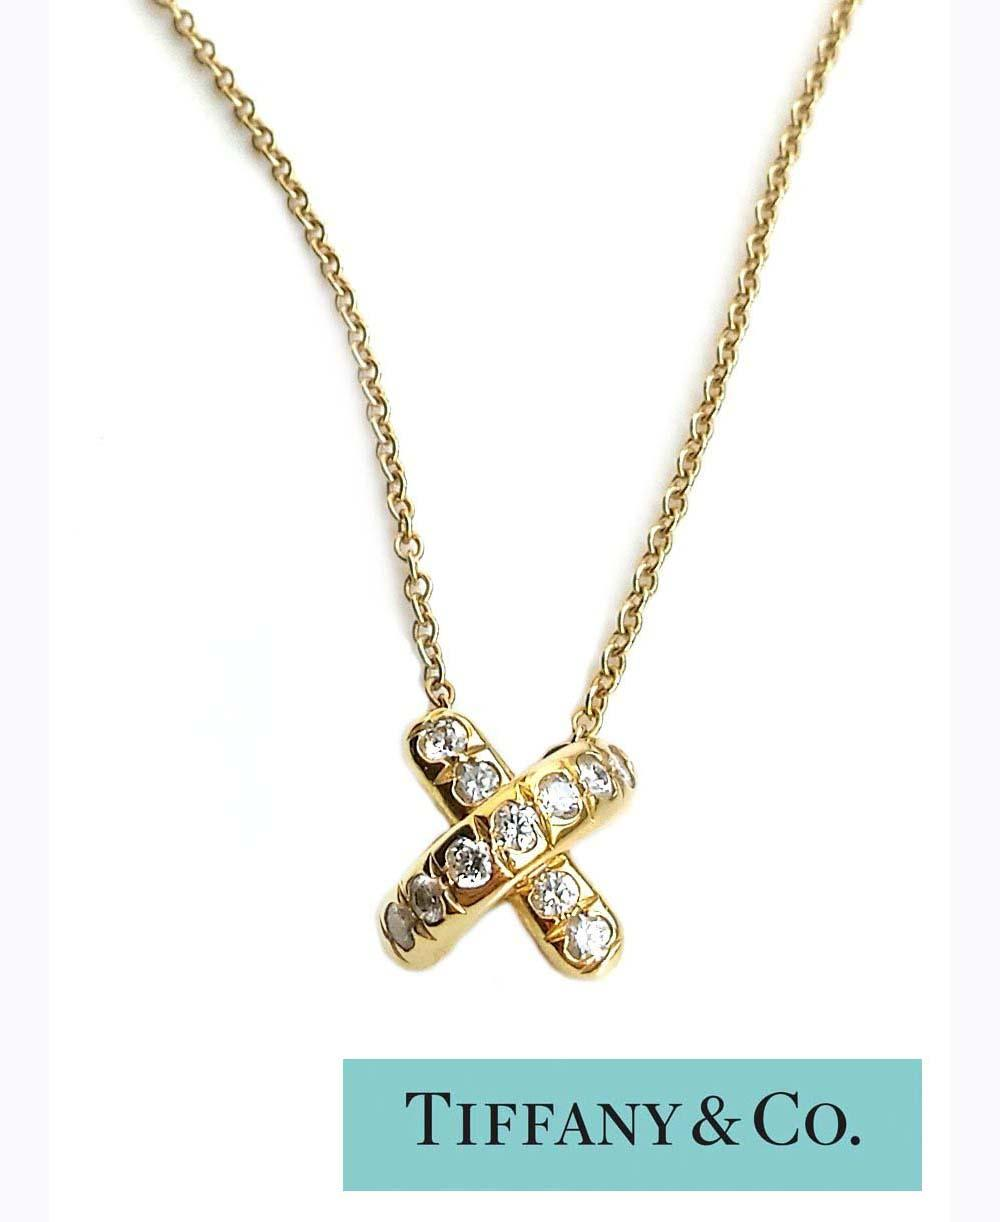 18K GOLD TIFFANY DIAMOND SIGNATURE 'X' PENDANT NECKLACE